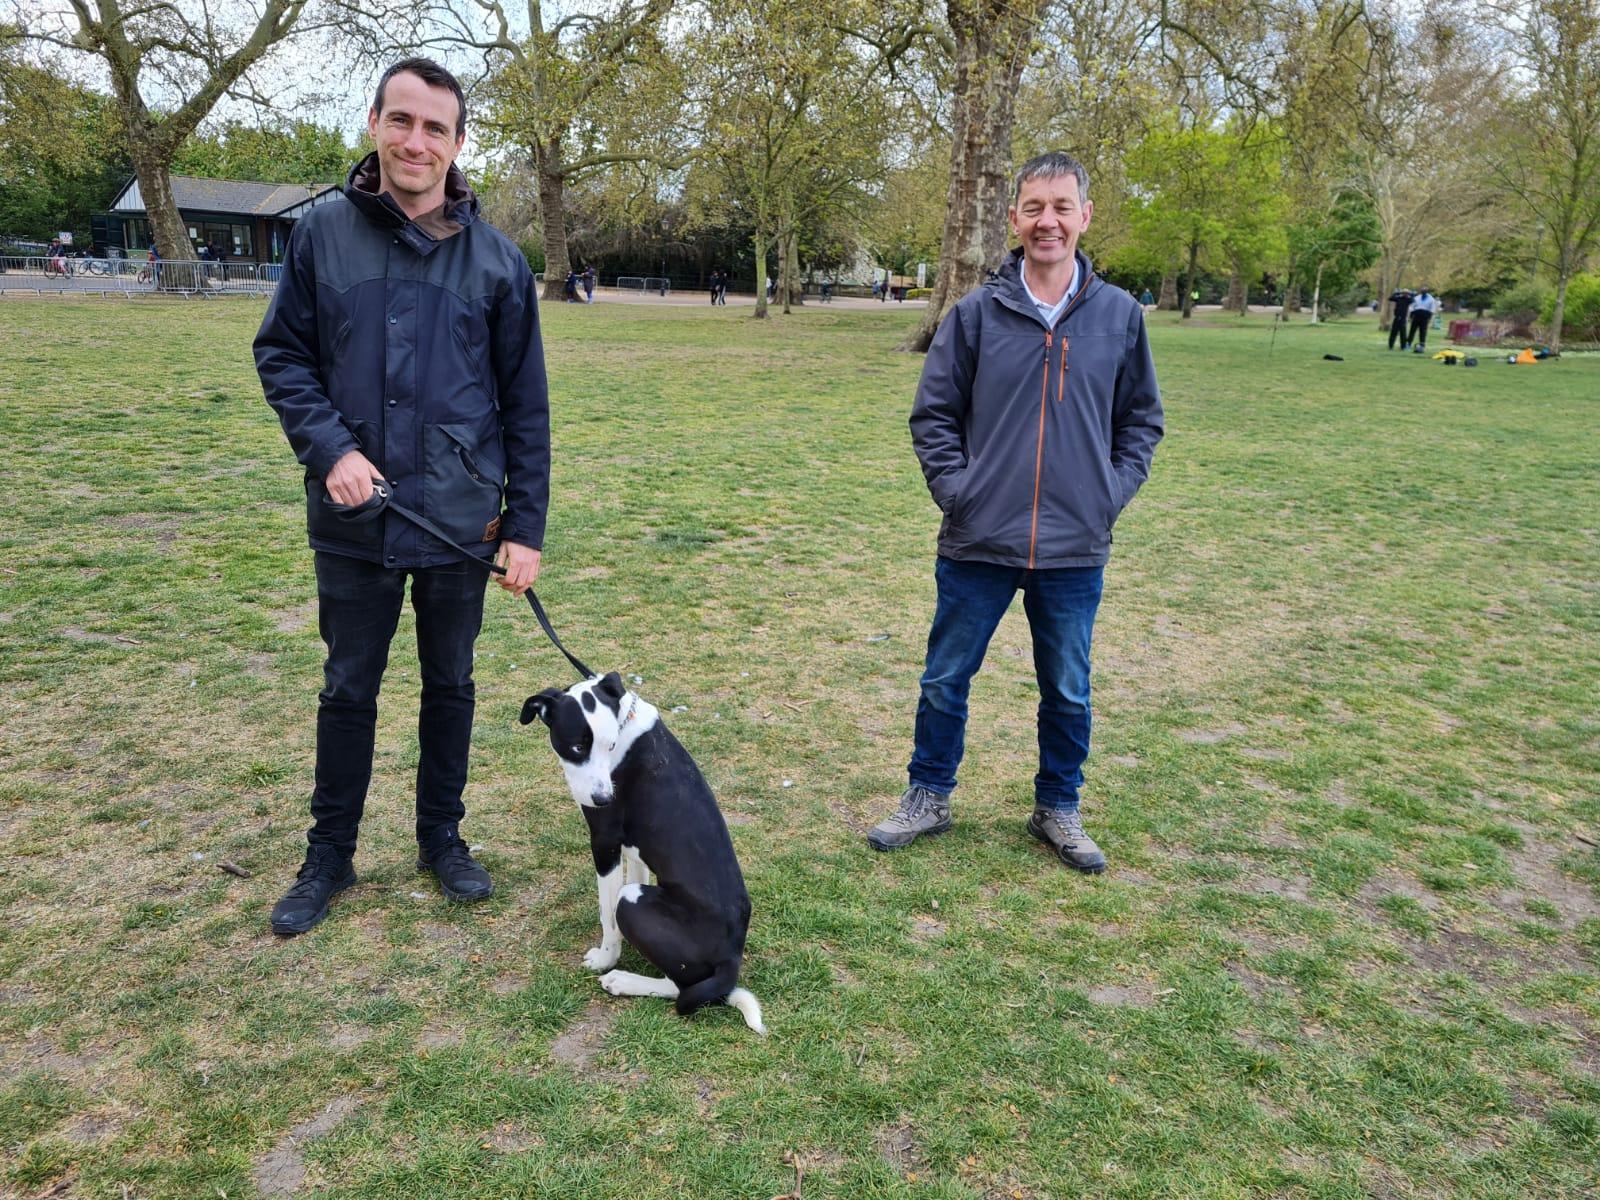 Adam & Monty his Collie Dog Boot Camp Vislor